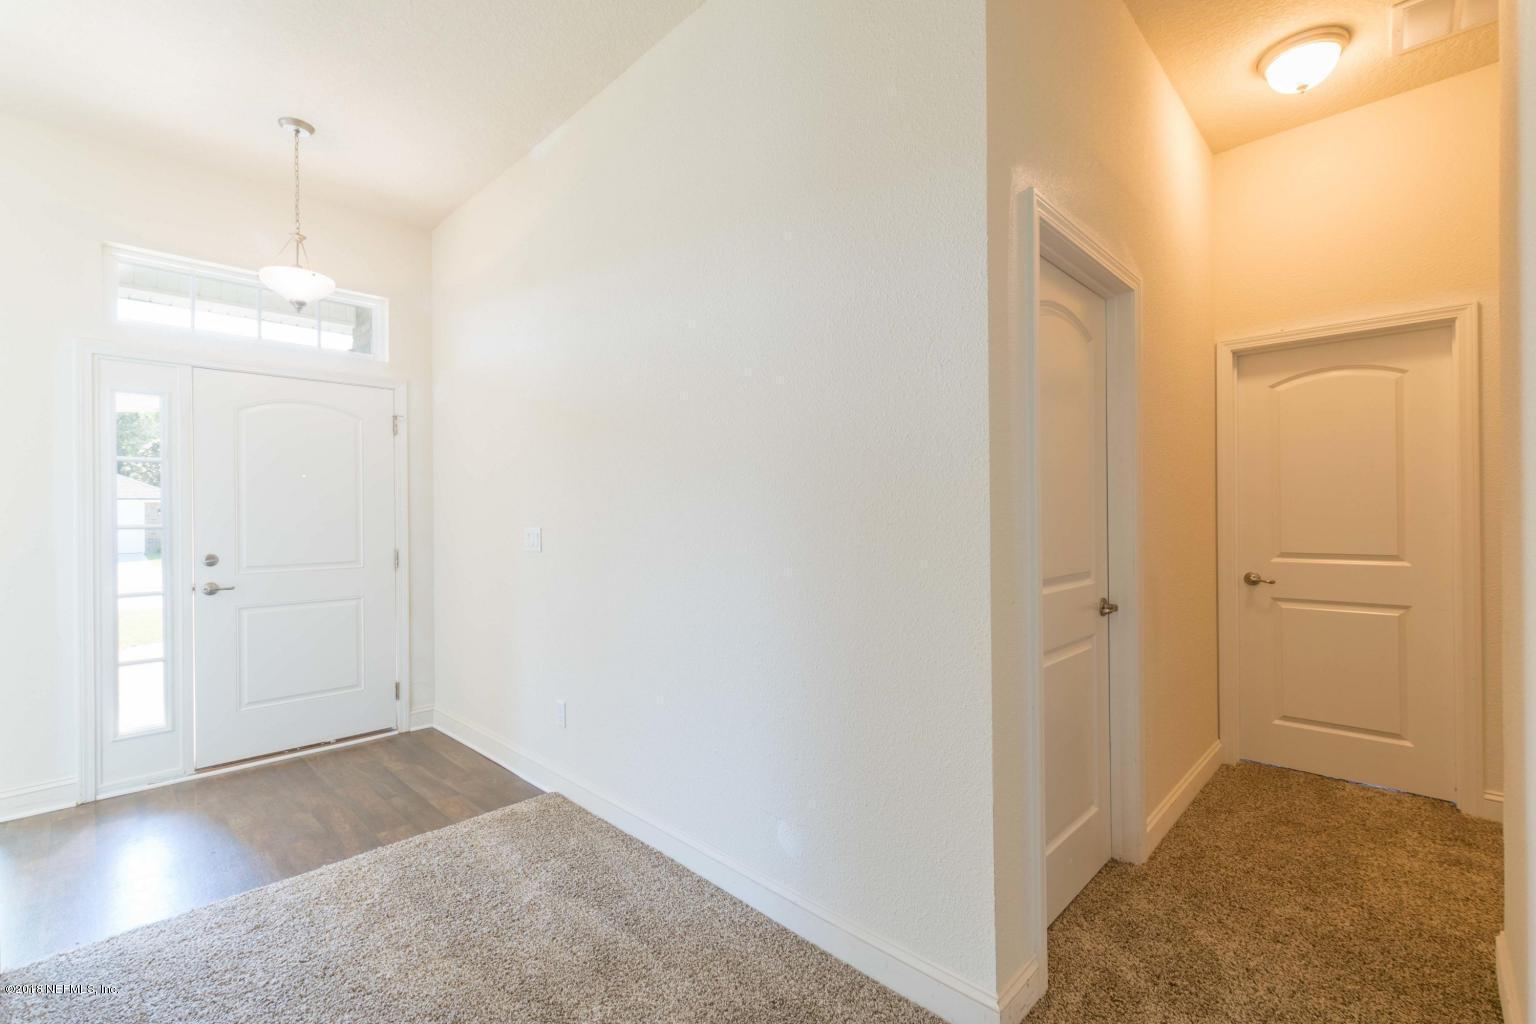 12319 DEWHURST, JACKSONVILLE, FLORIDA 32218, 4 Bedrooms Bedrooms, ,2 BathroomsBathrooms,Residential - single family,For sale,DEWHURST,947646